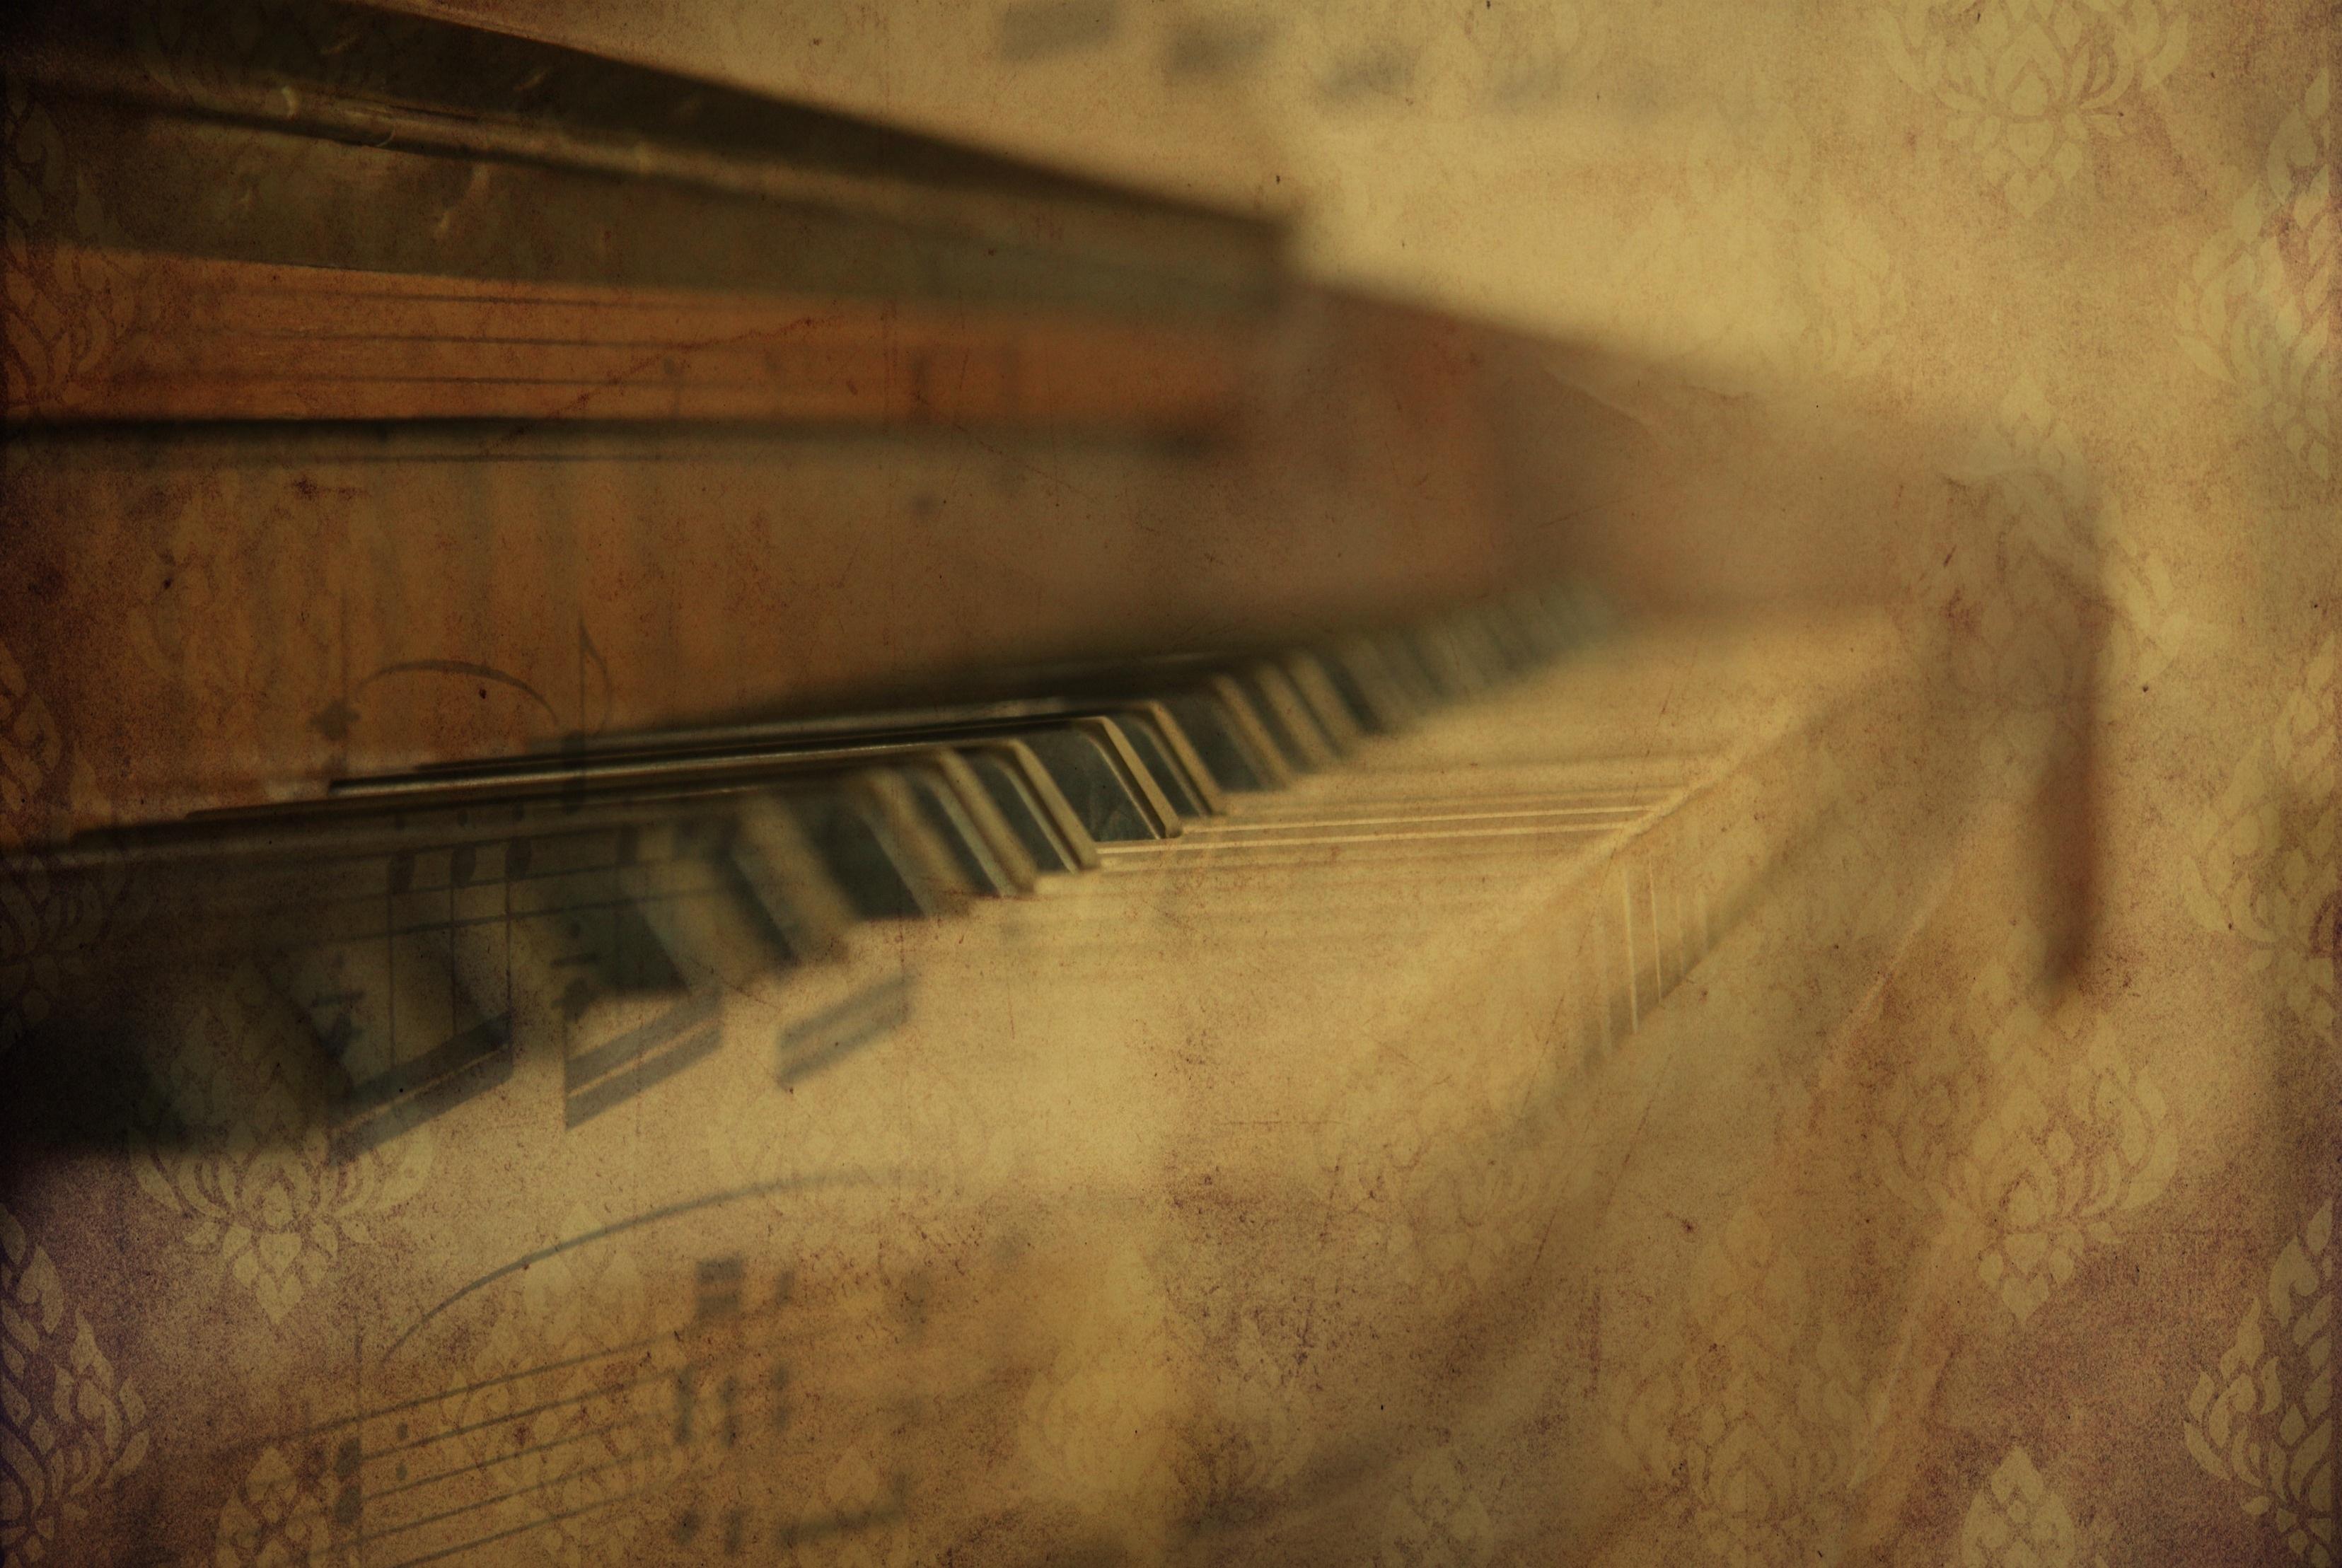 Gambar Cahaya Struktur Kayu Keyboard Antik Sinar Matahari